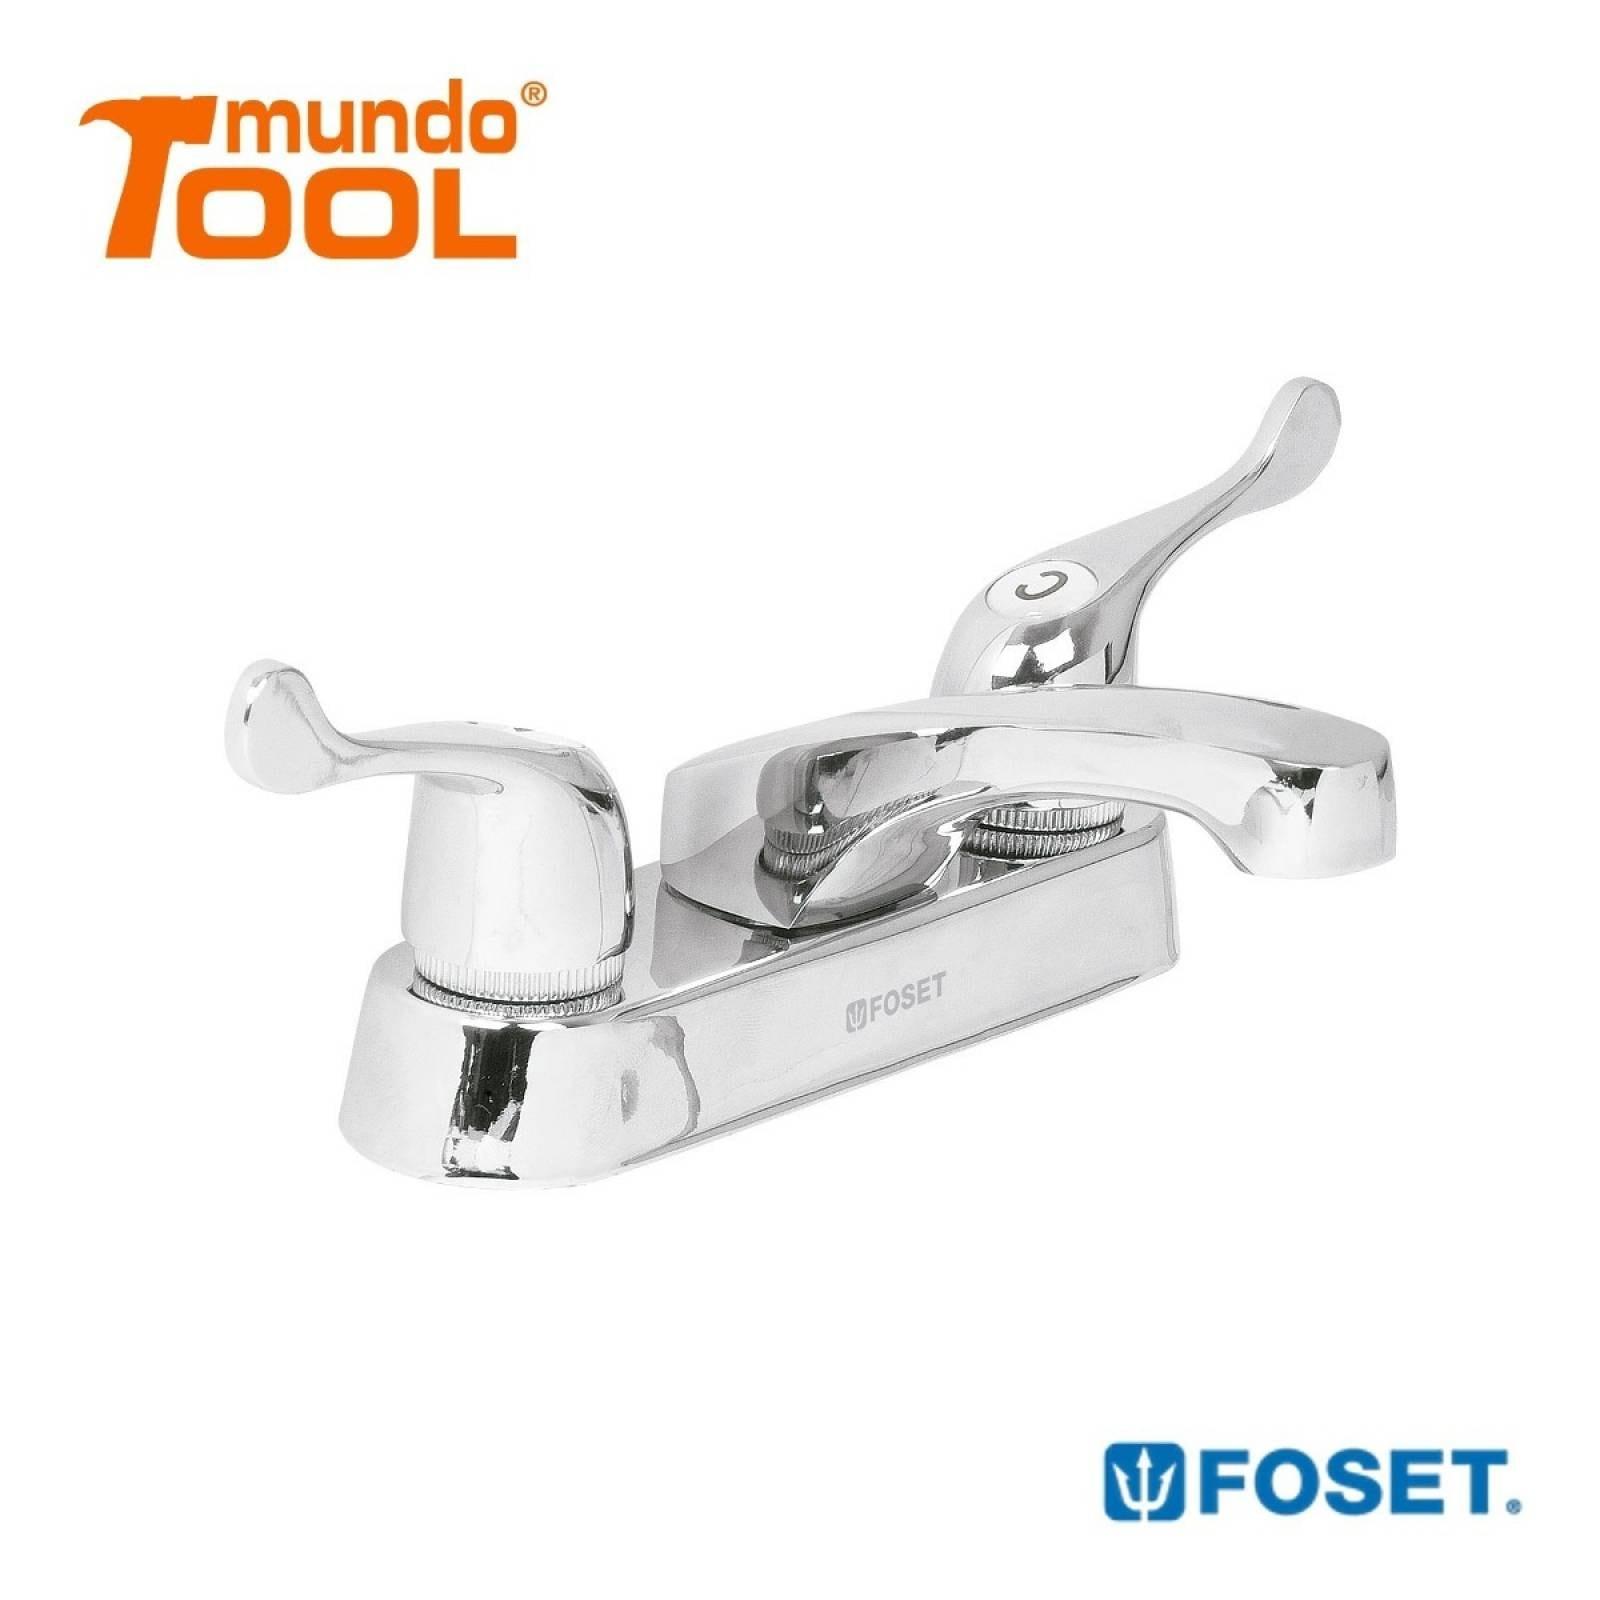 Mezcladora Lavabo Manerales Palanca Basic Foset 49278